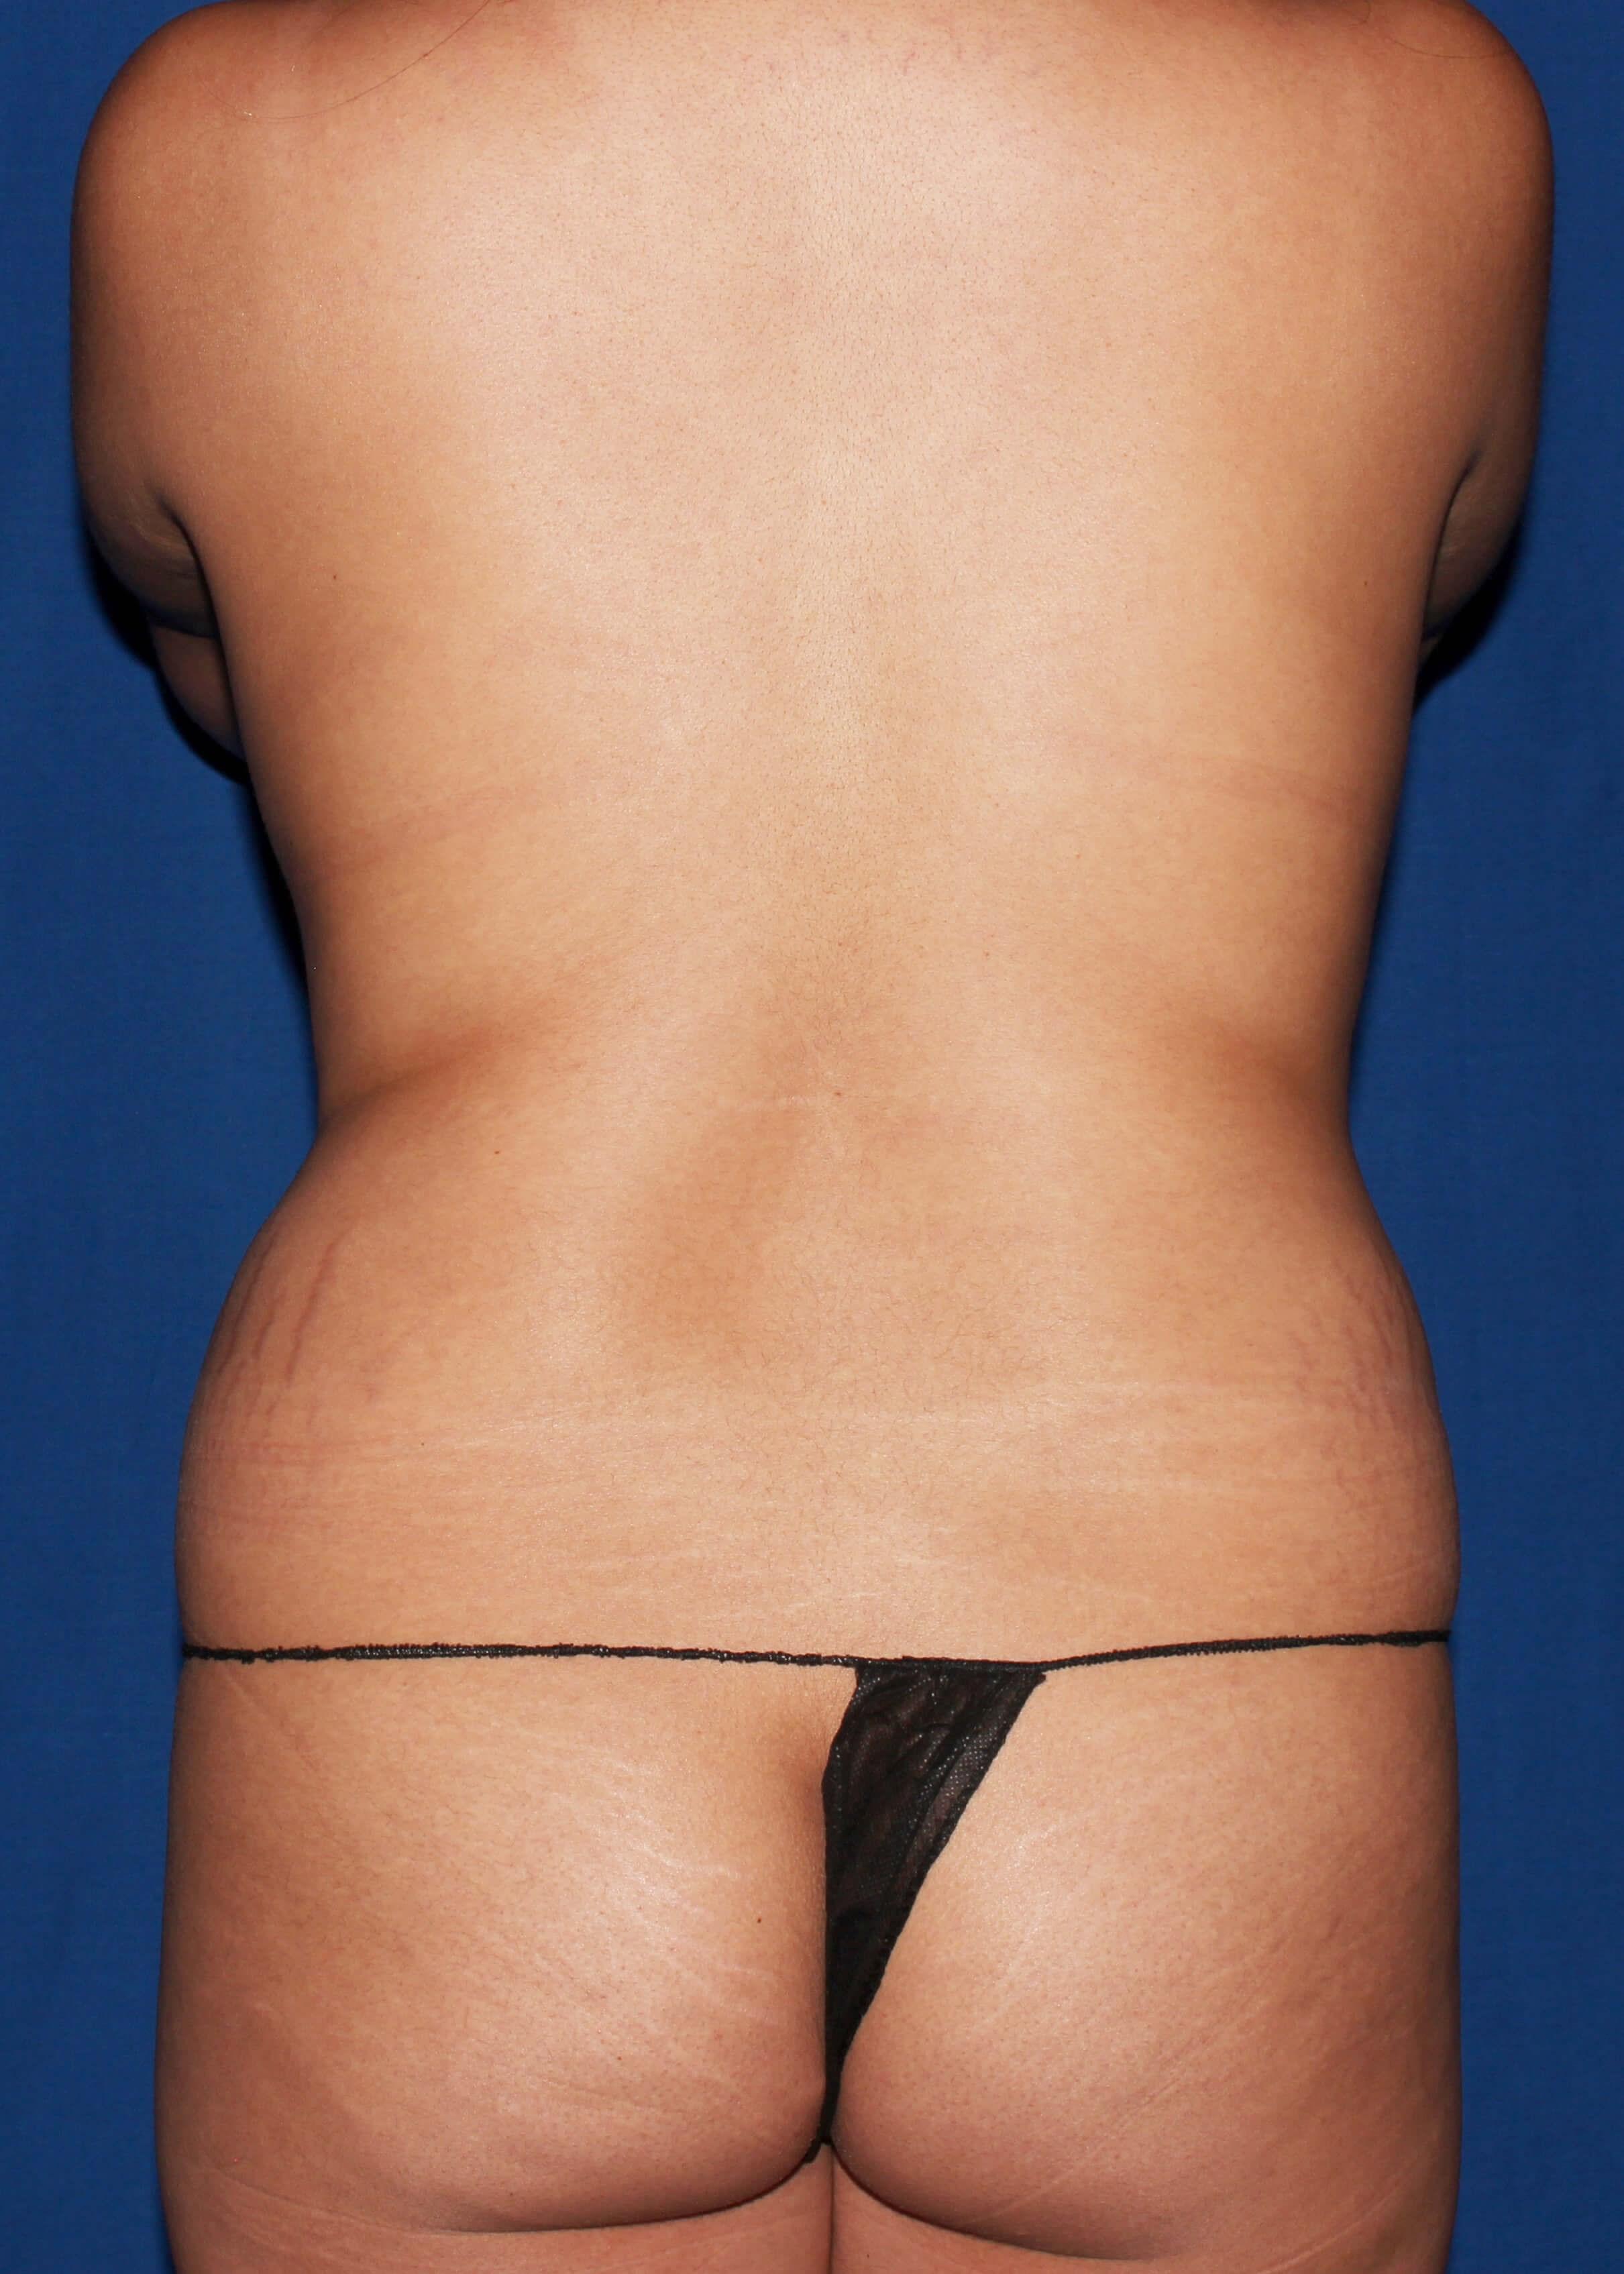 Before Liposuction - scottsdale snatchted waist AZ